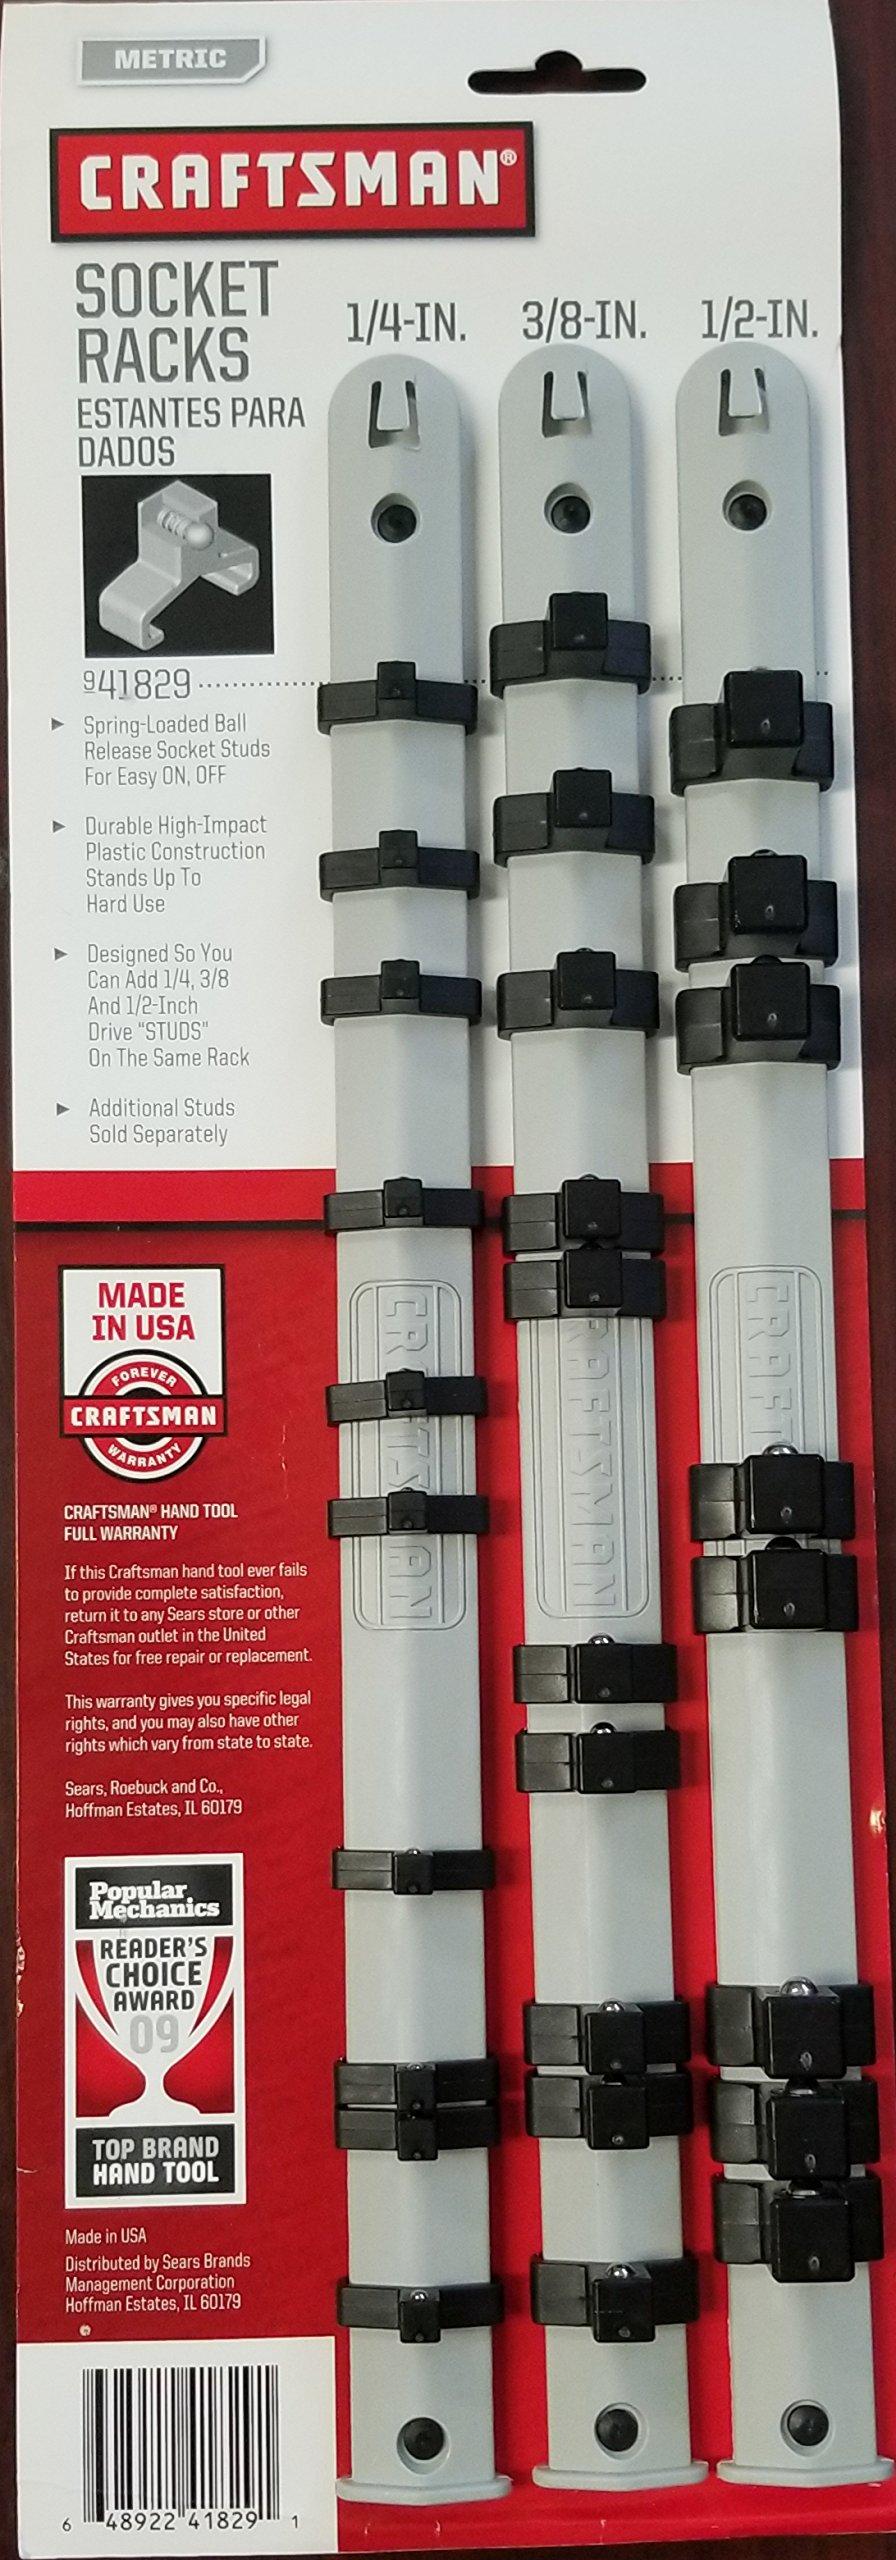 Craftsman 3 pc. Socket Holder Racks - Made in USA